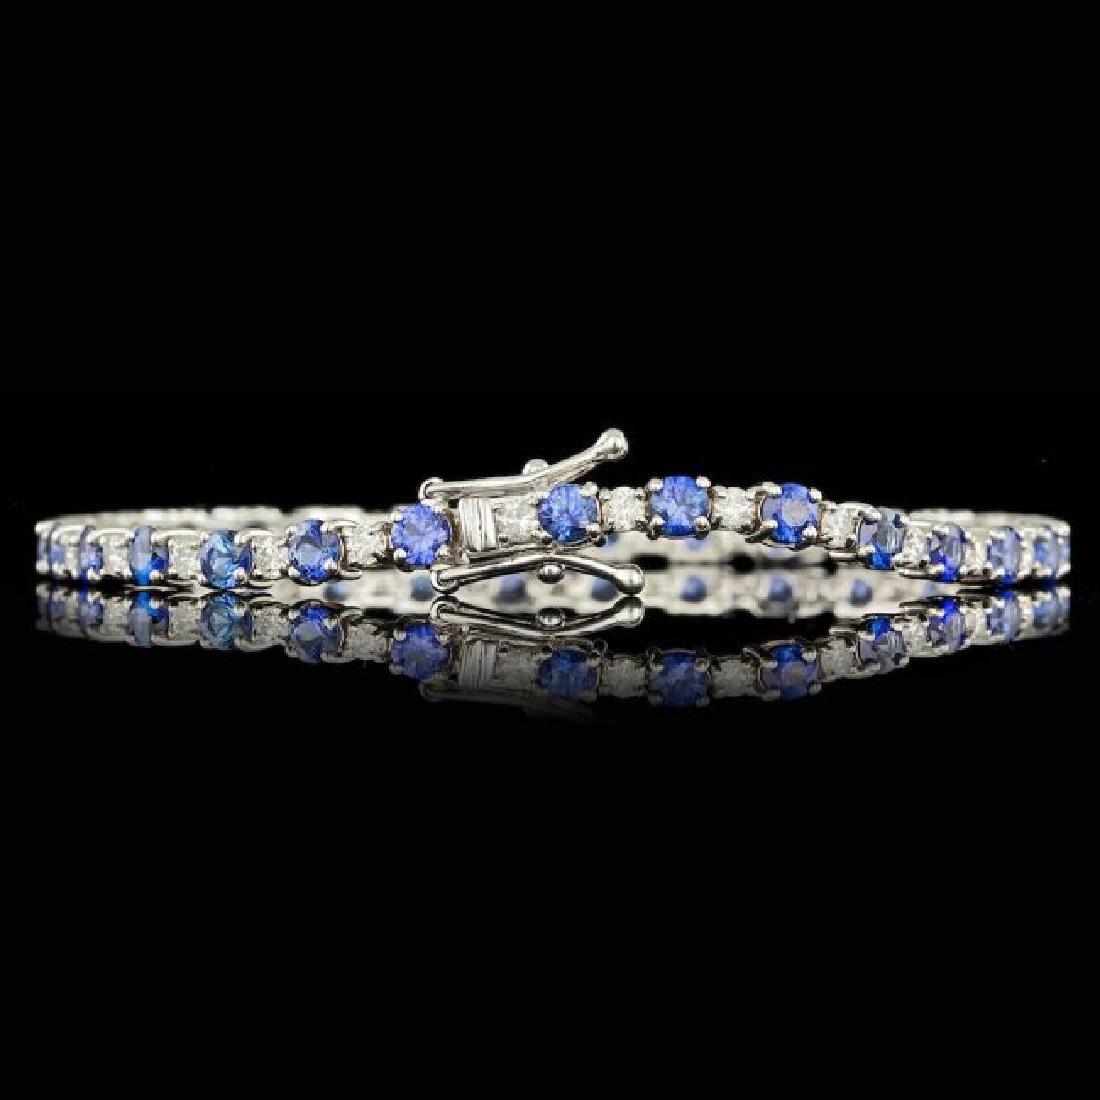 14k Gold 6.00ct Sapphire 1.65ct Diamond Bracelet - 3